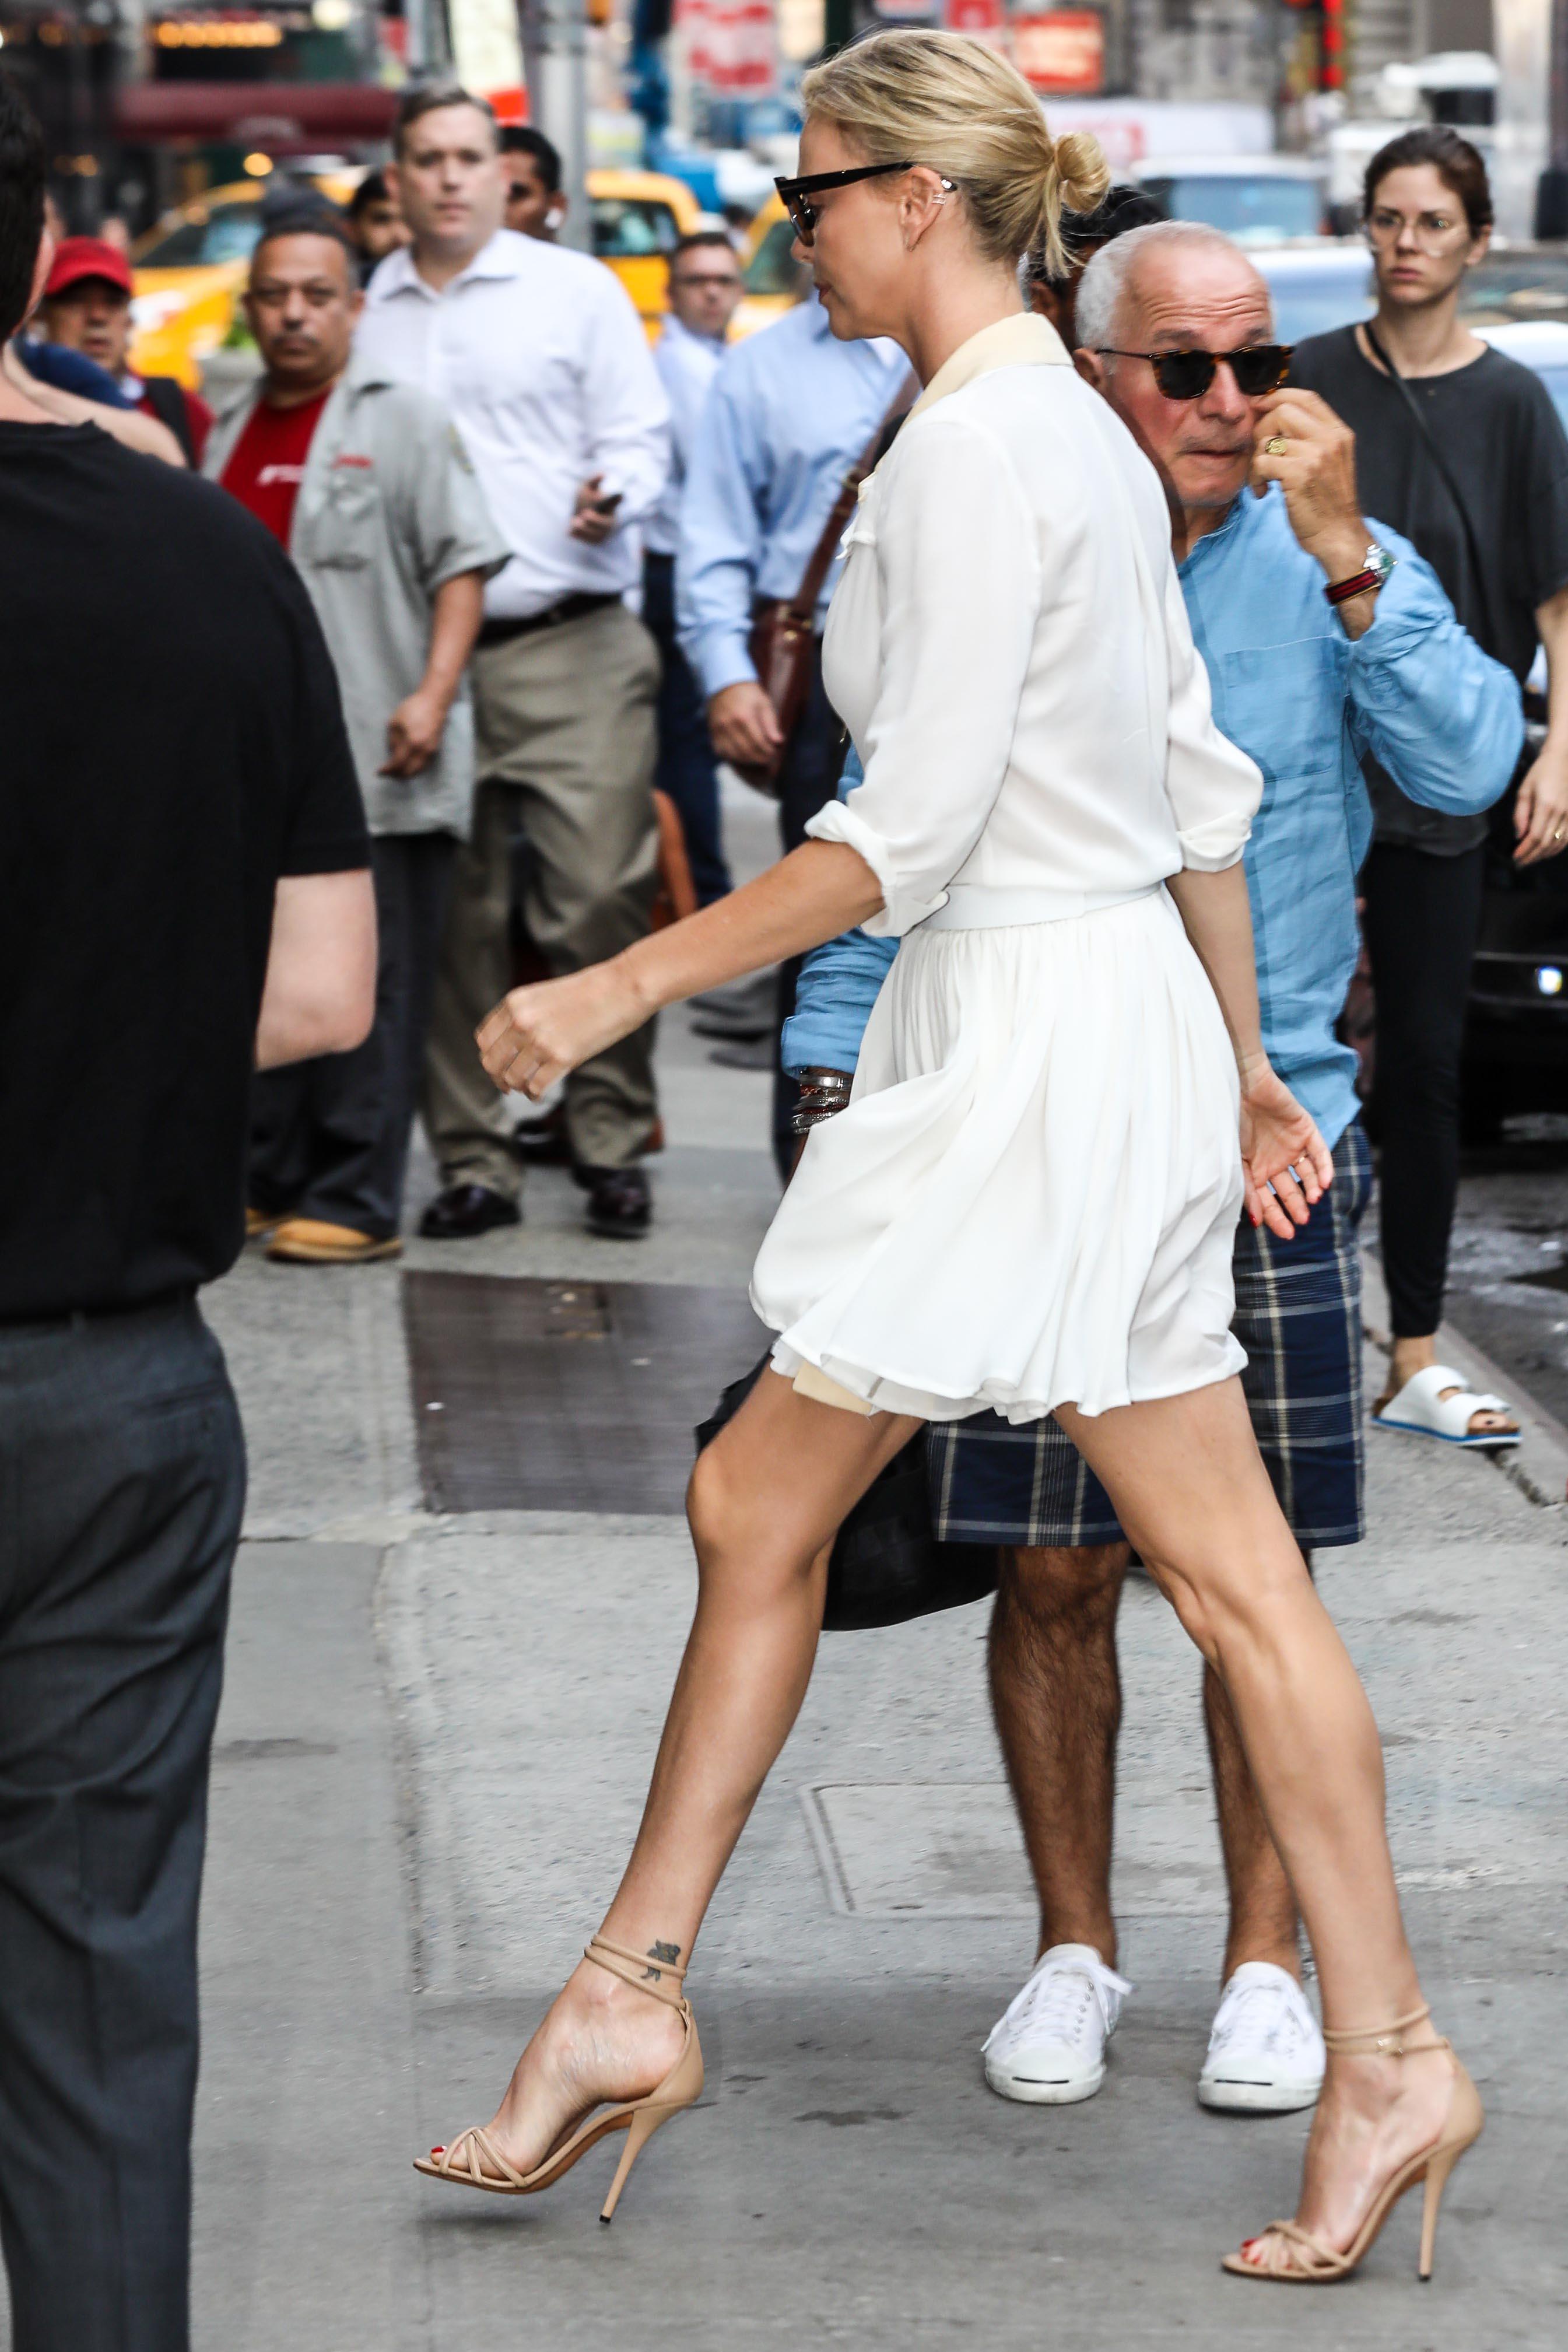 sexy legs nude arse